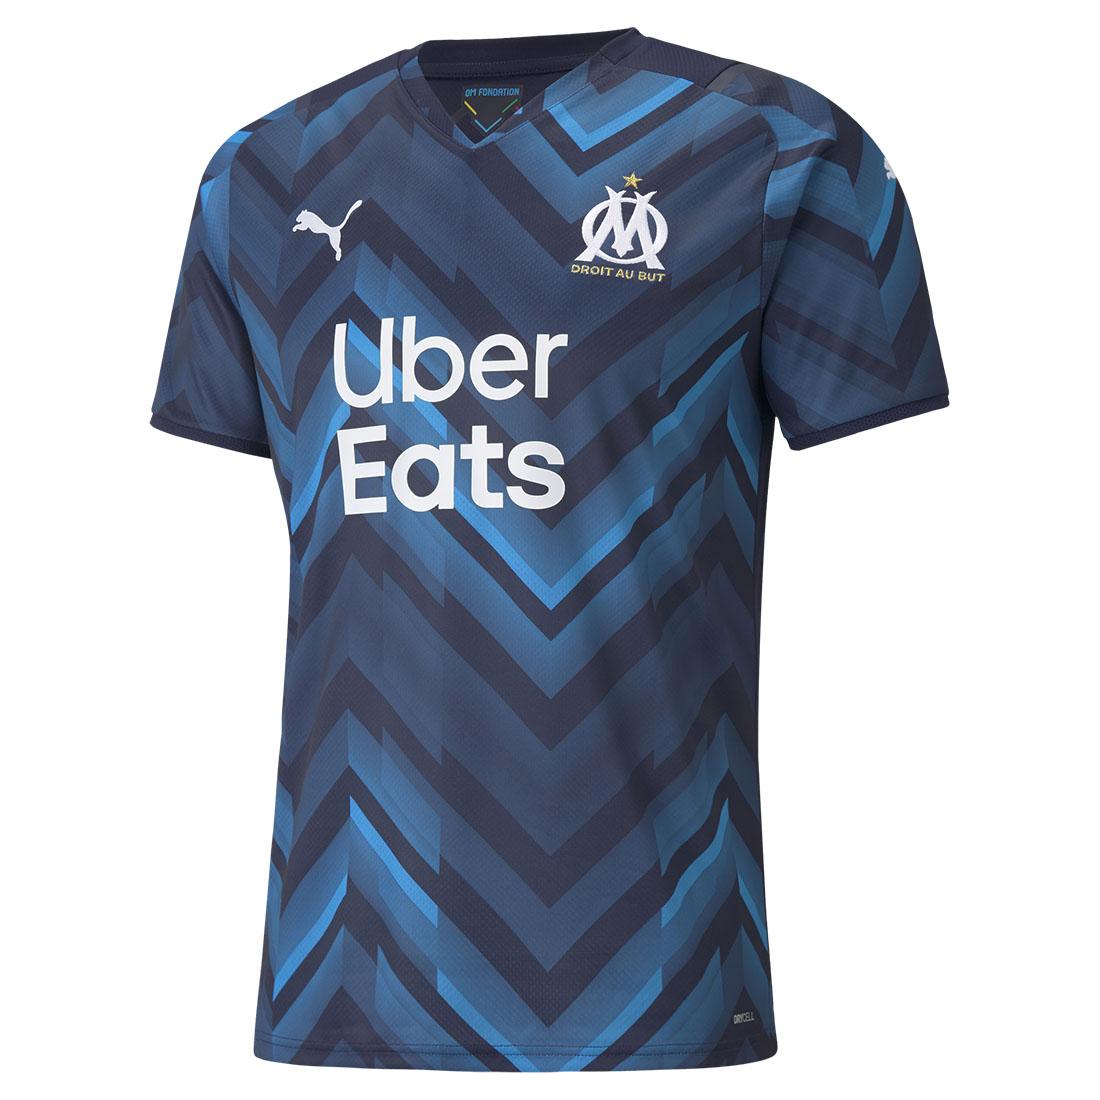 PUMA Football x Olympique de Marseille - Maillot Extérieur 2021-2022